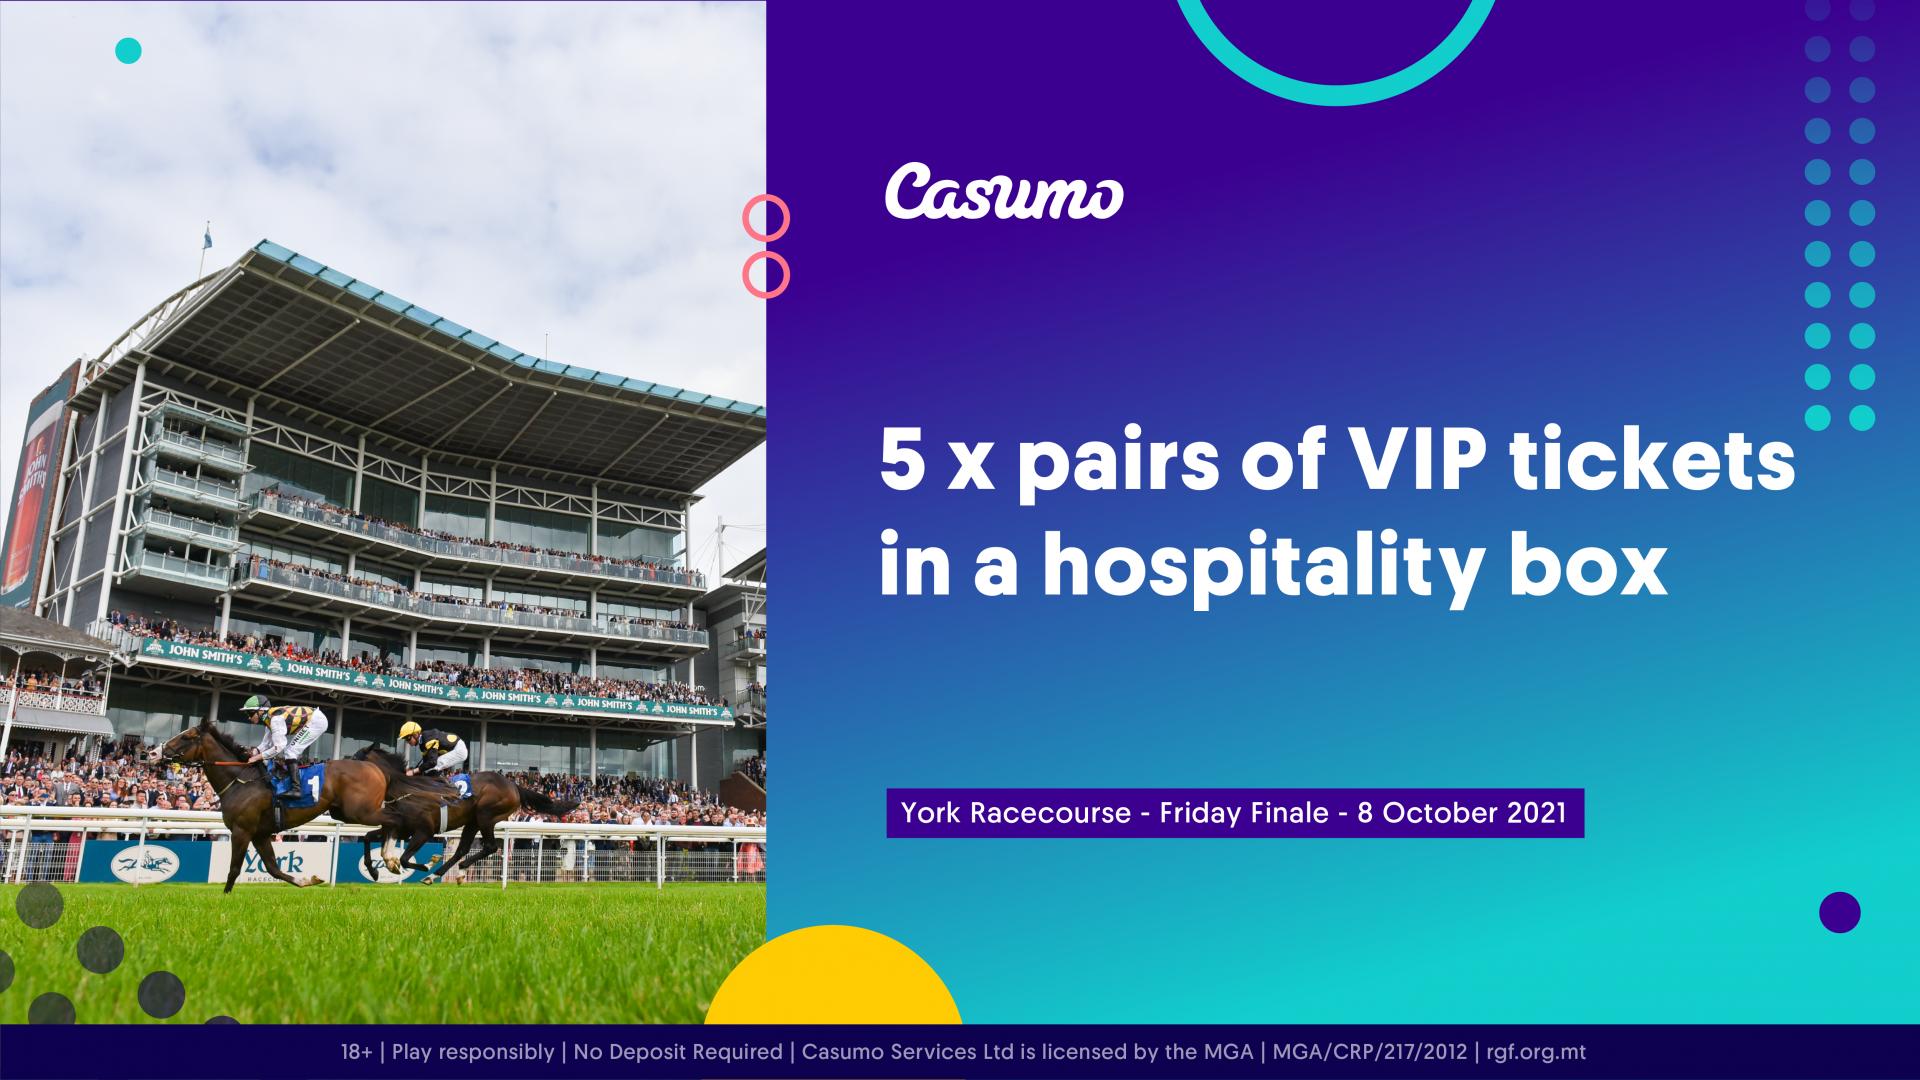 Win VIP tickets to York